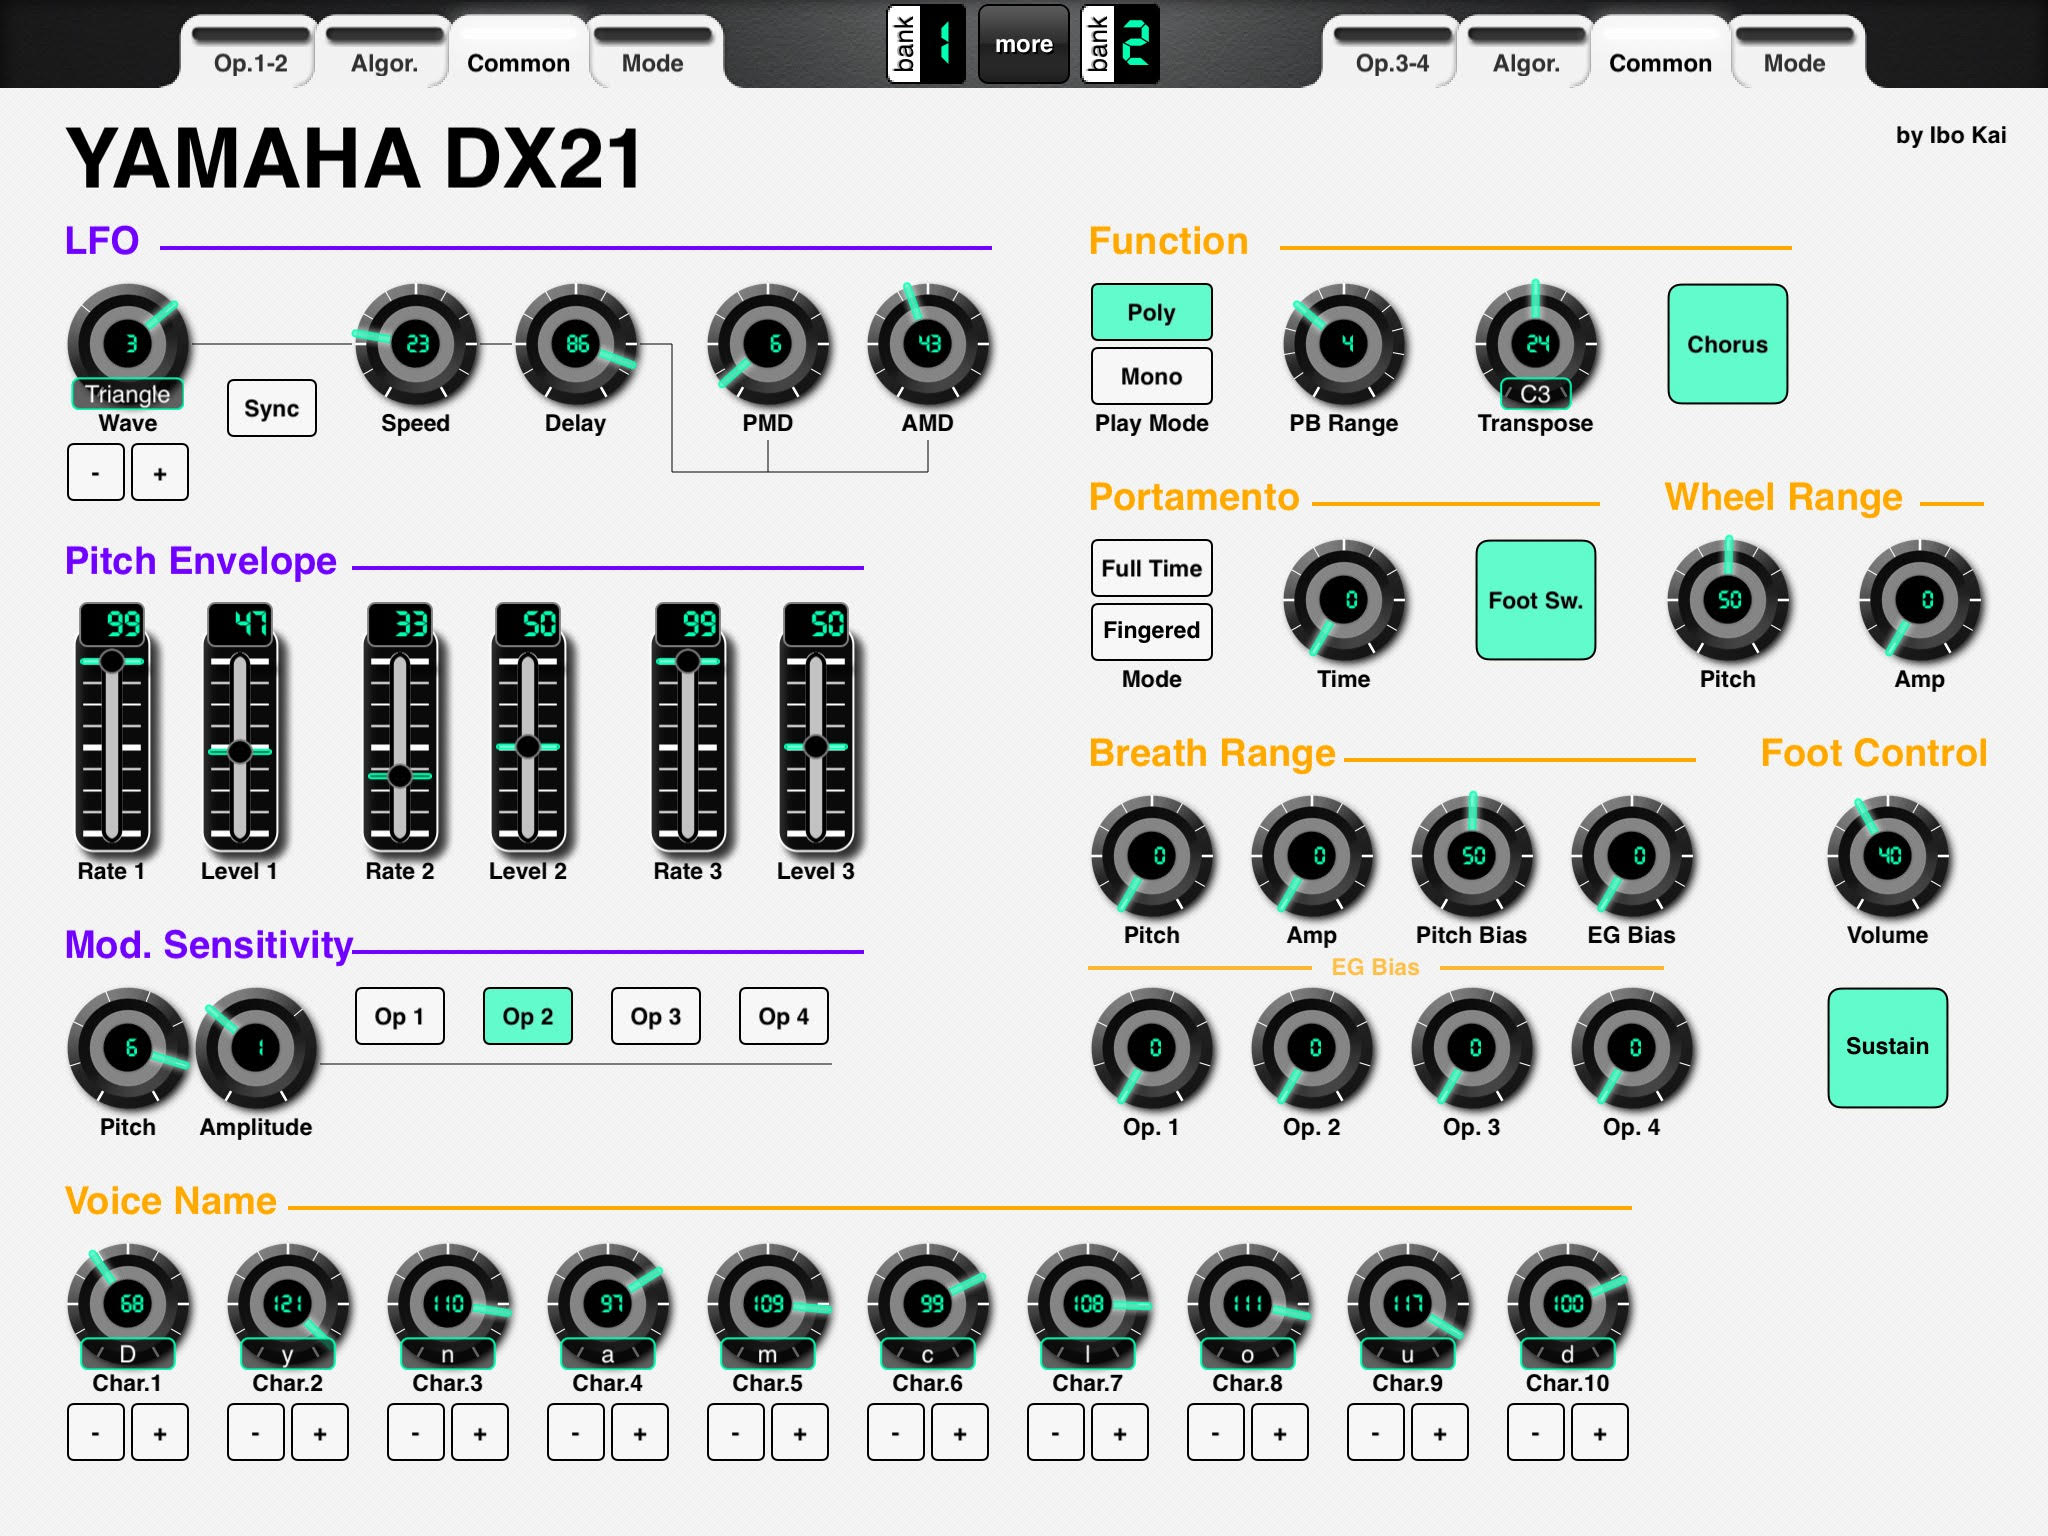 LAYOUT: Voice Editor for Yamaha DX21 - MIDI Designer Q&A